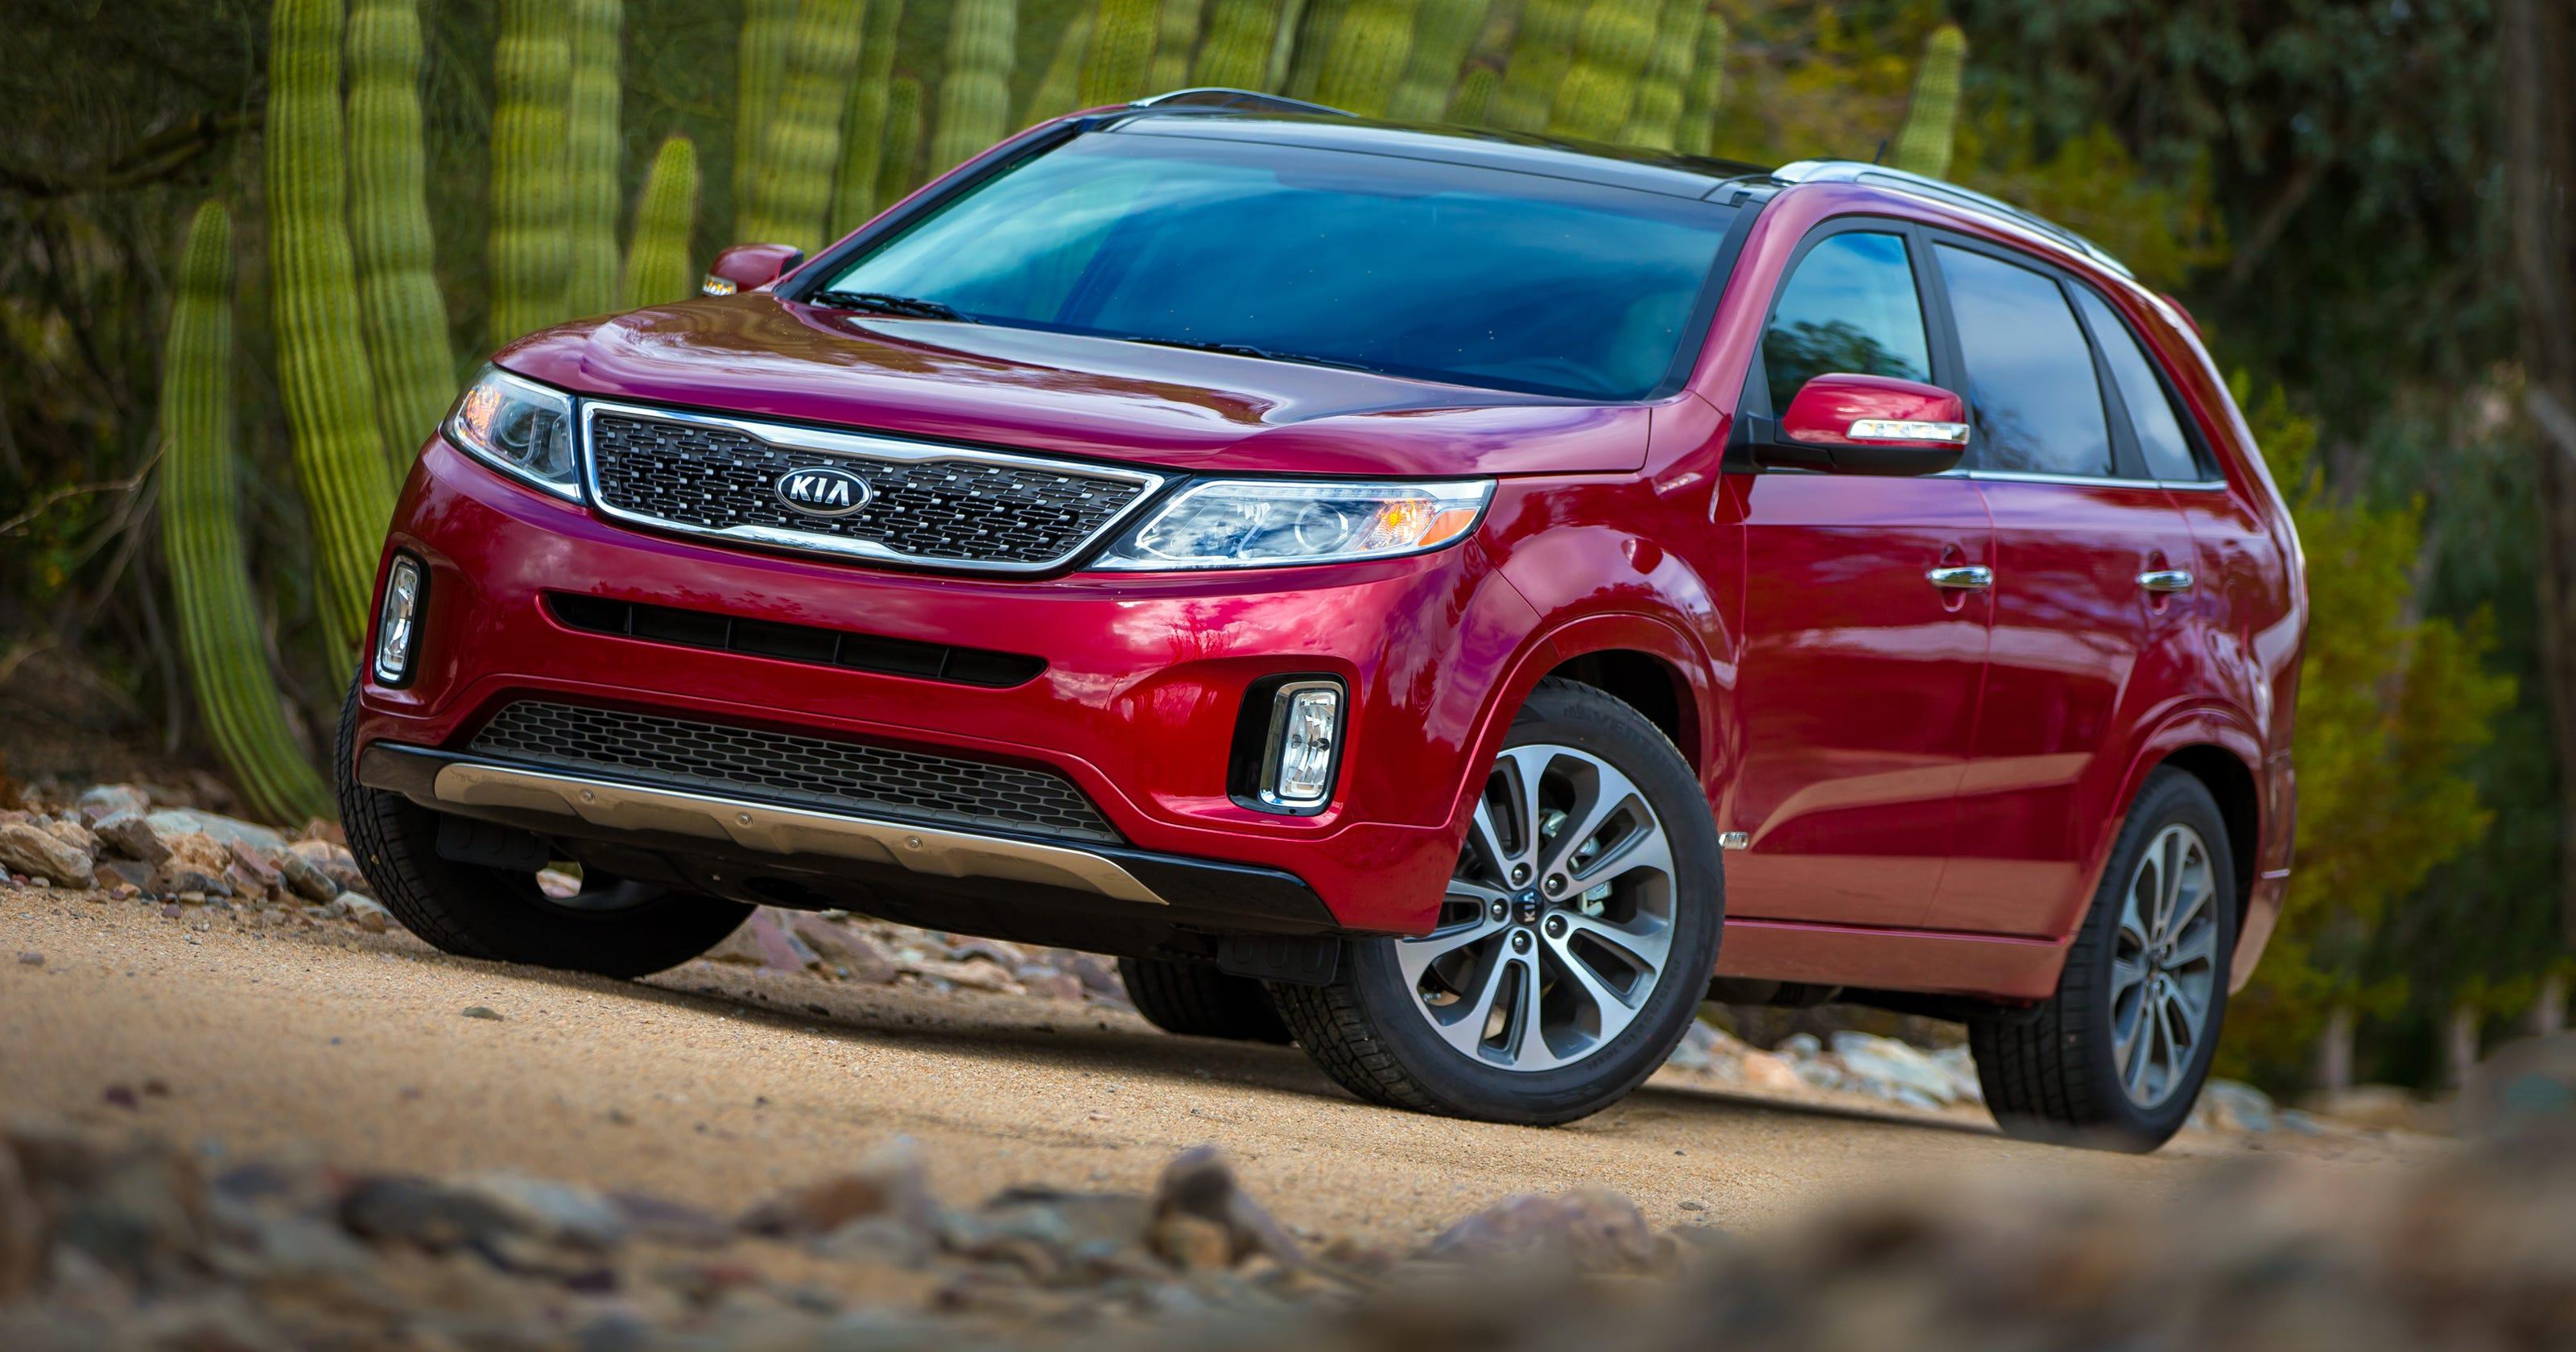 Kia Sorento Hyundai Santa Fe Recalled For Axle Problem Motors Recalls